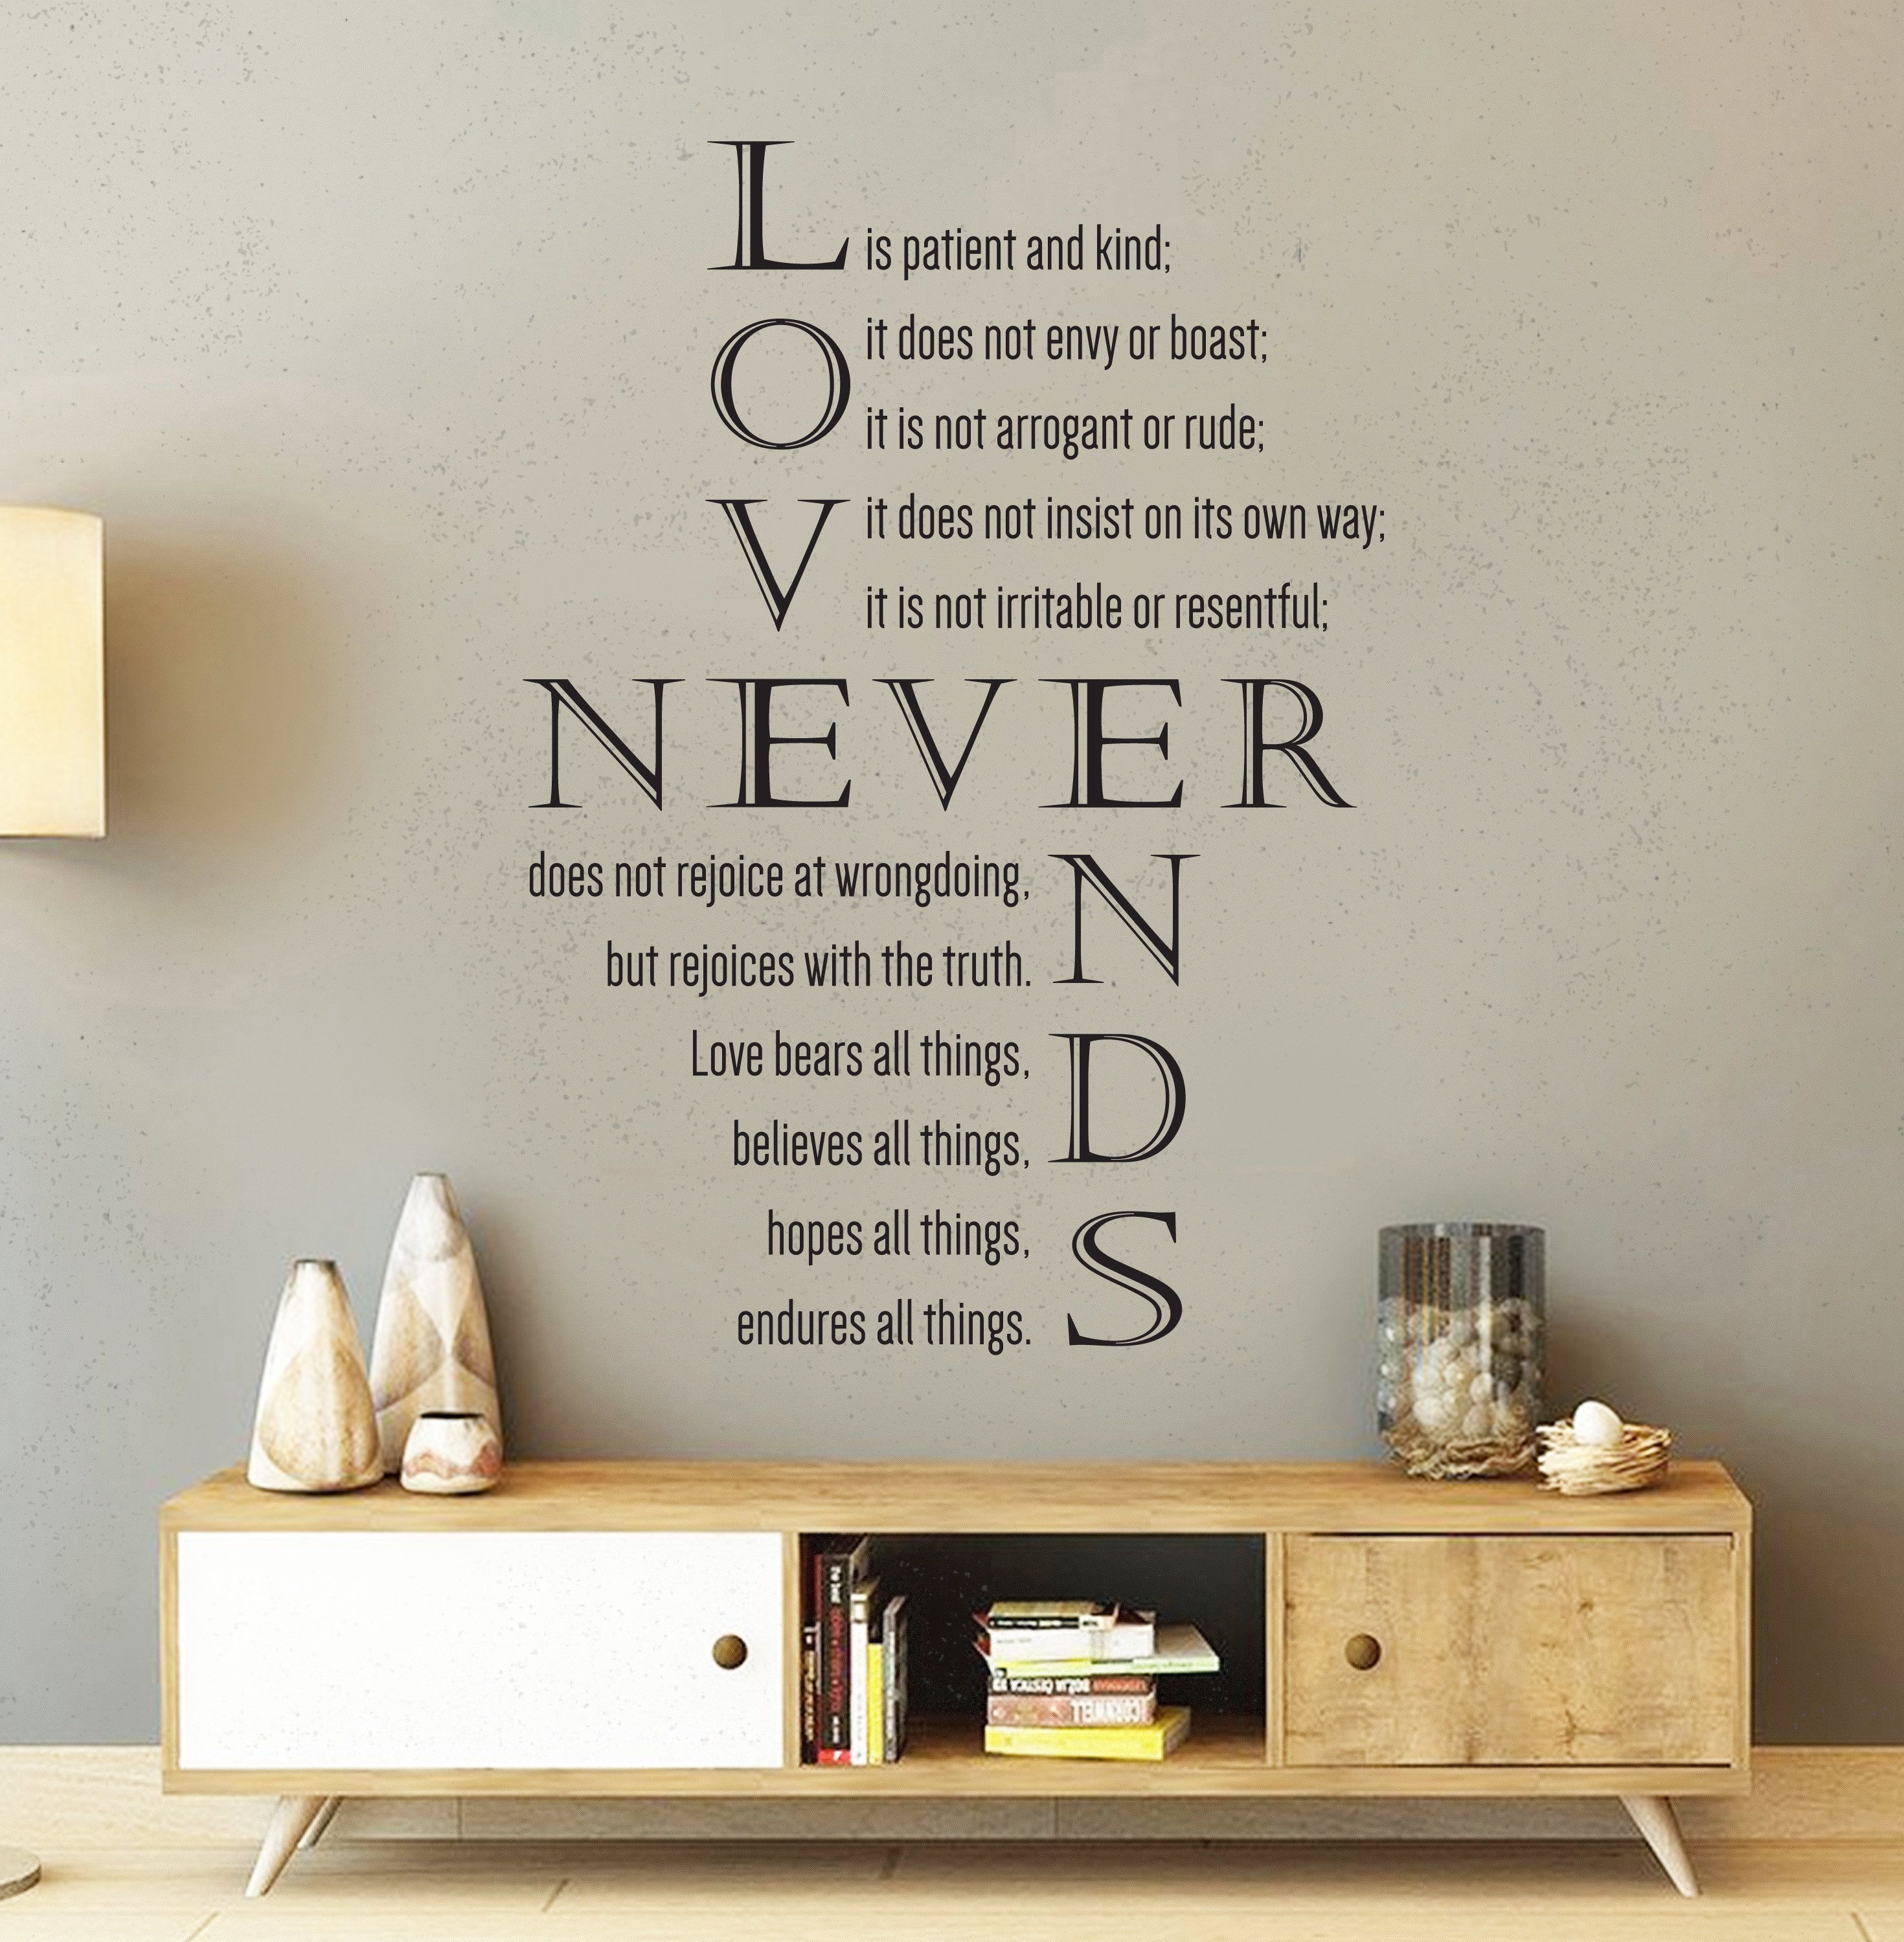 Vinyl Wall Decal 1 Corinthians 13 4 8 Love Is Etsy Vinyl Wall Decals Wall Decals Love Bears All Things